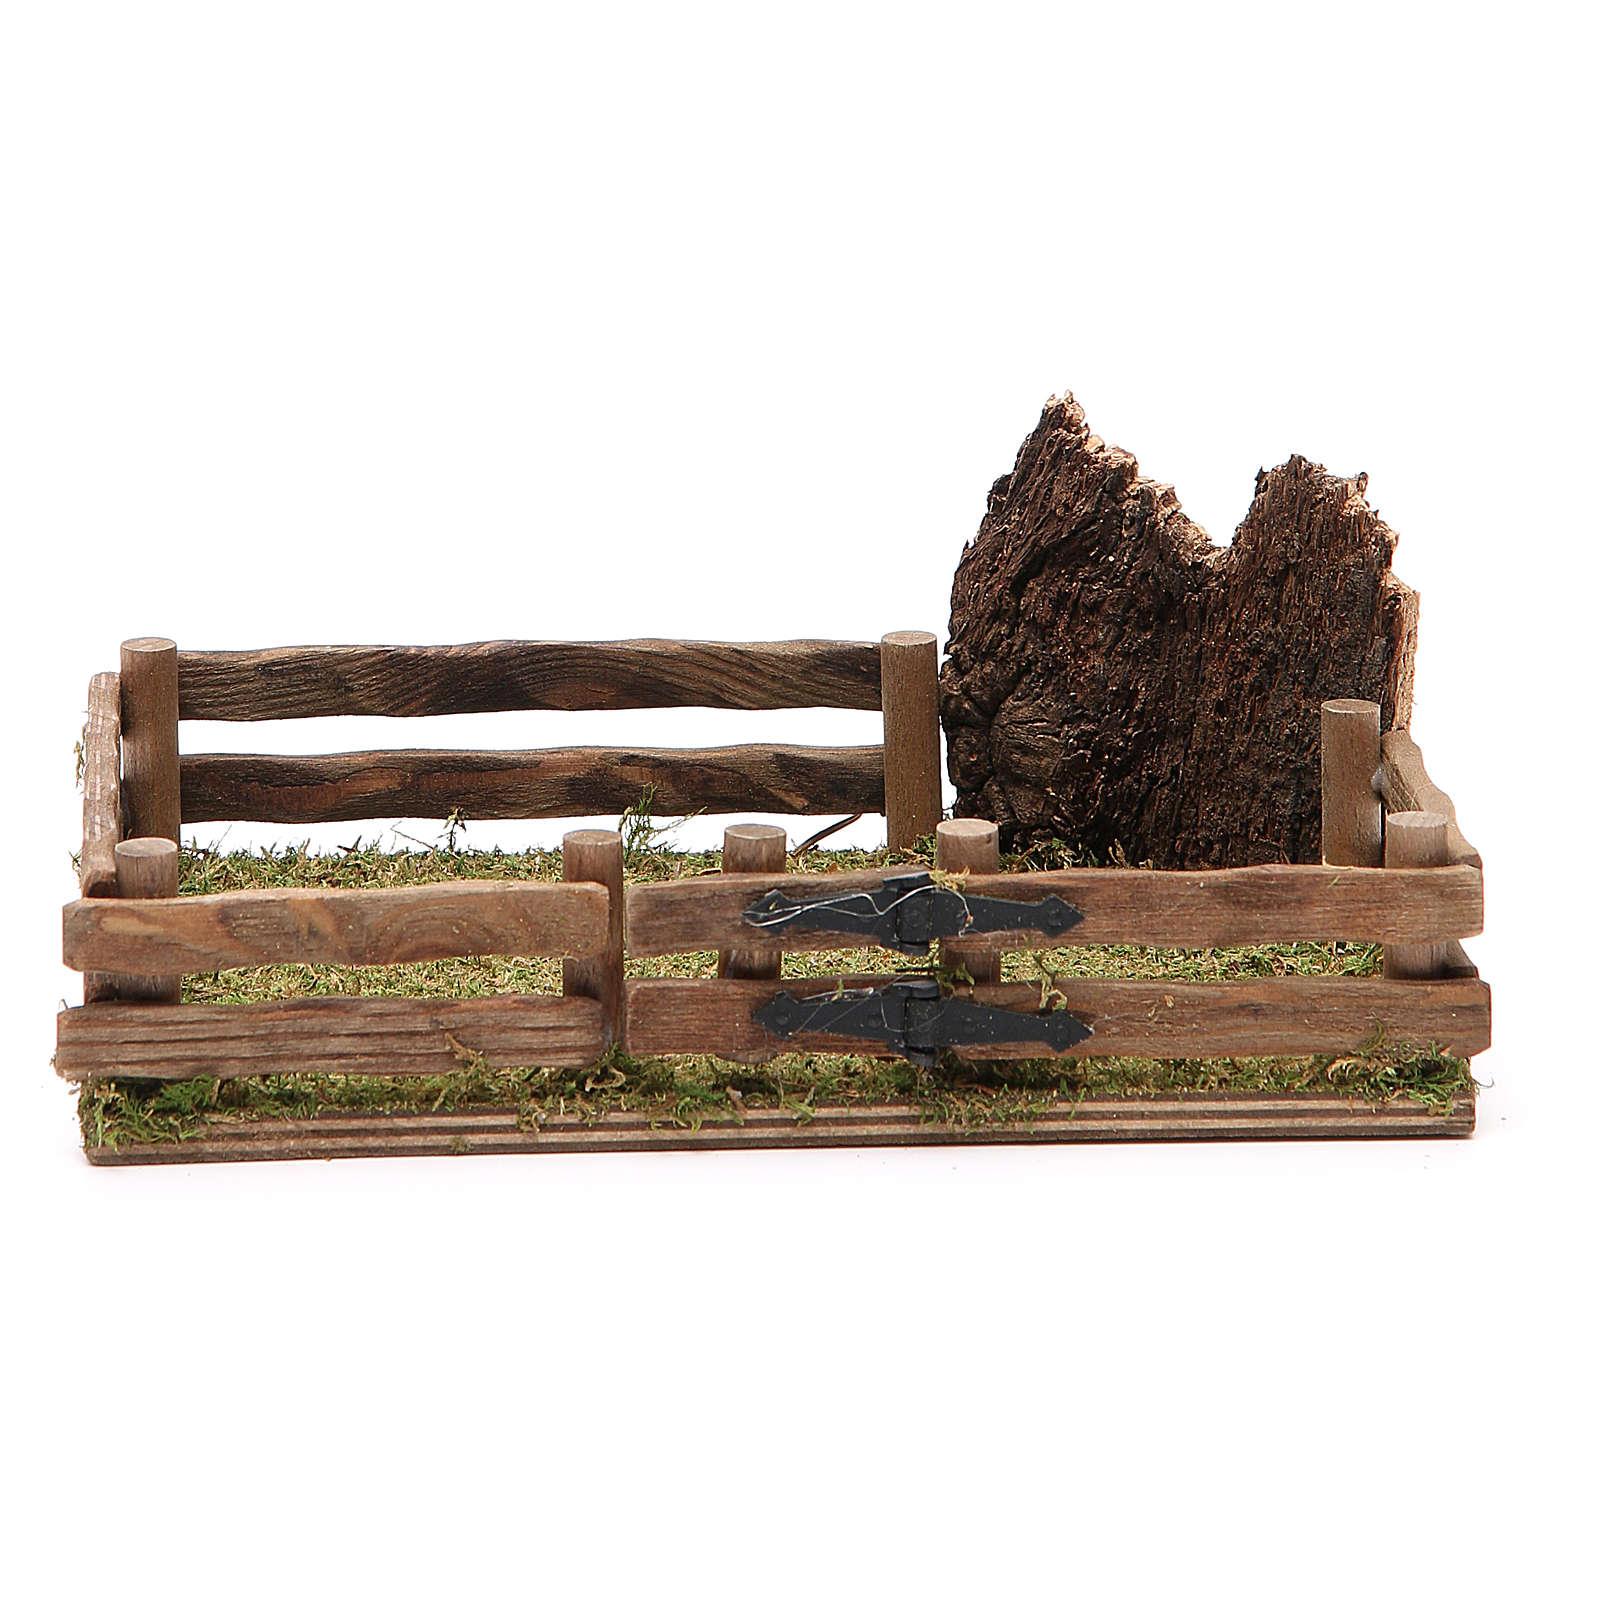 Recinto in legno presepe 12x18 cm 4